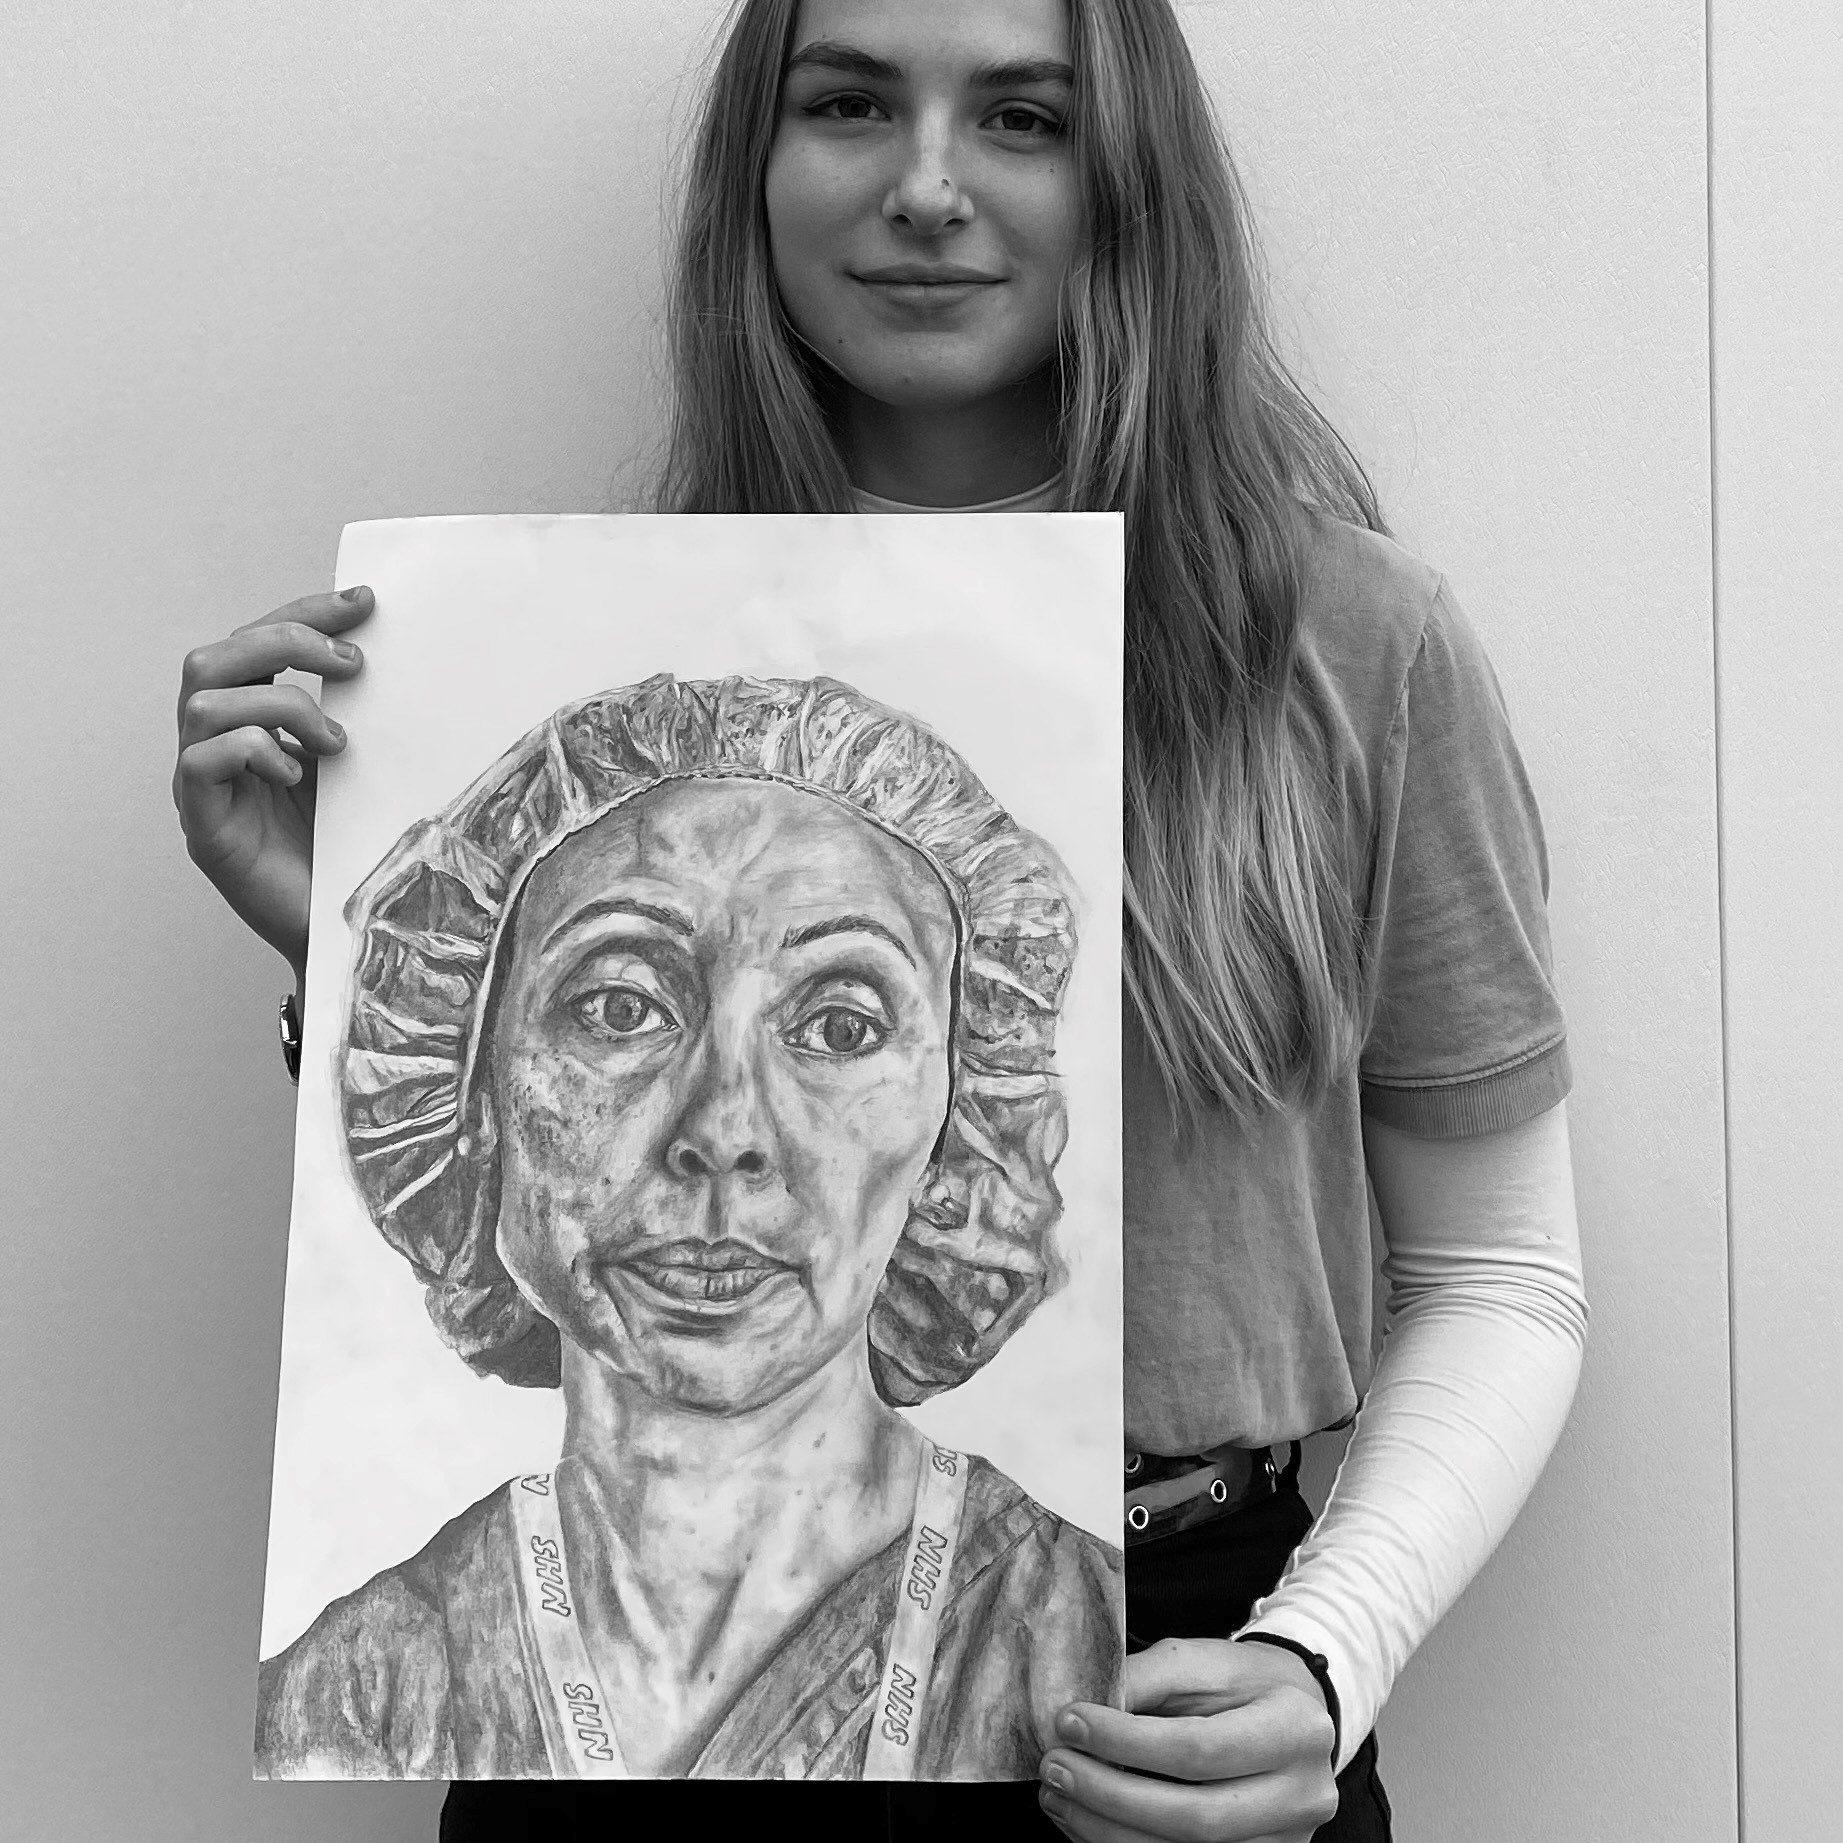 Poppy Ashmolean artist in residence drawing bw2.png